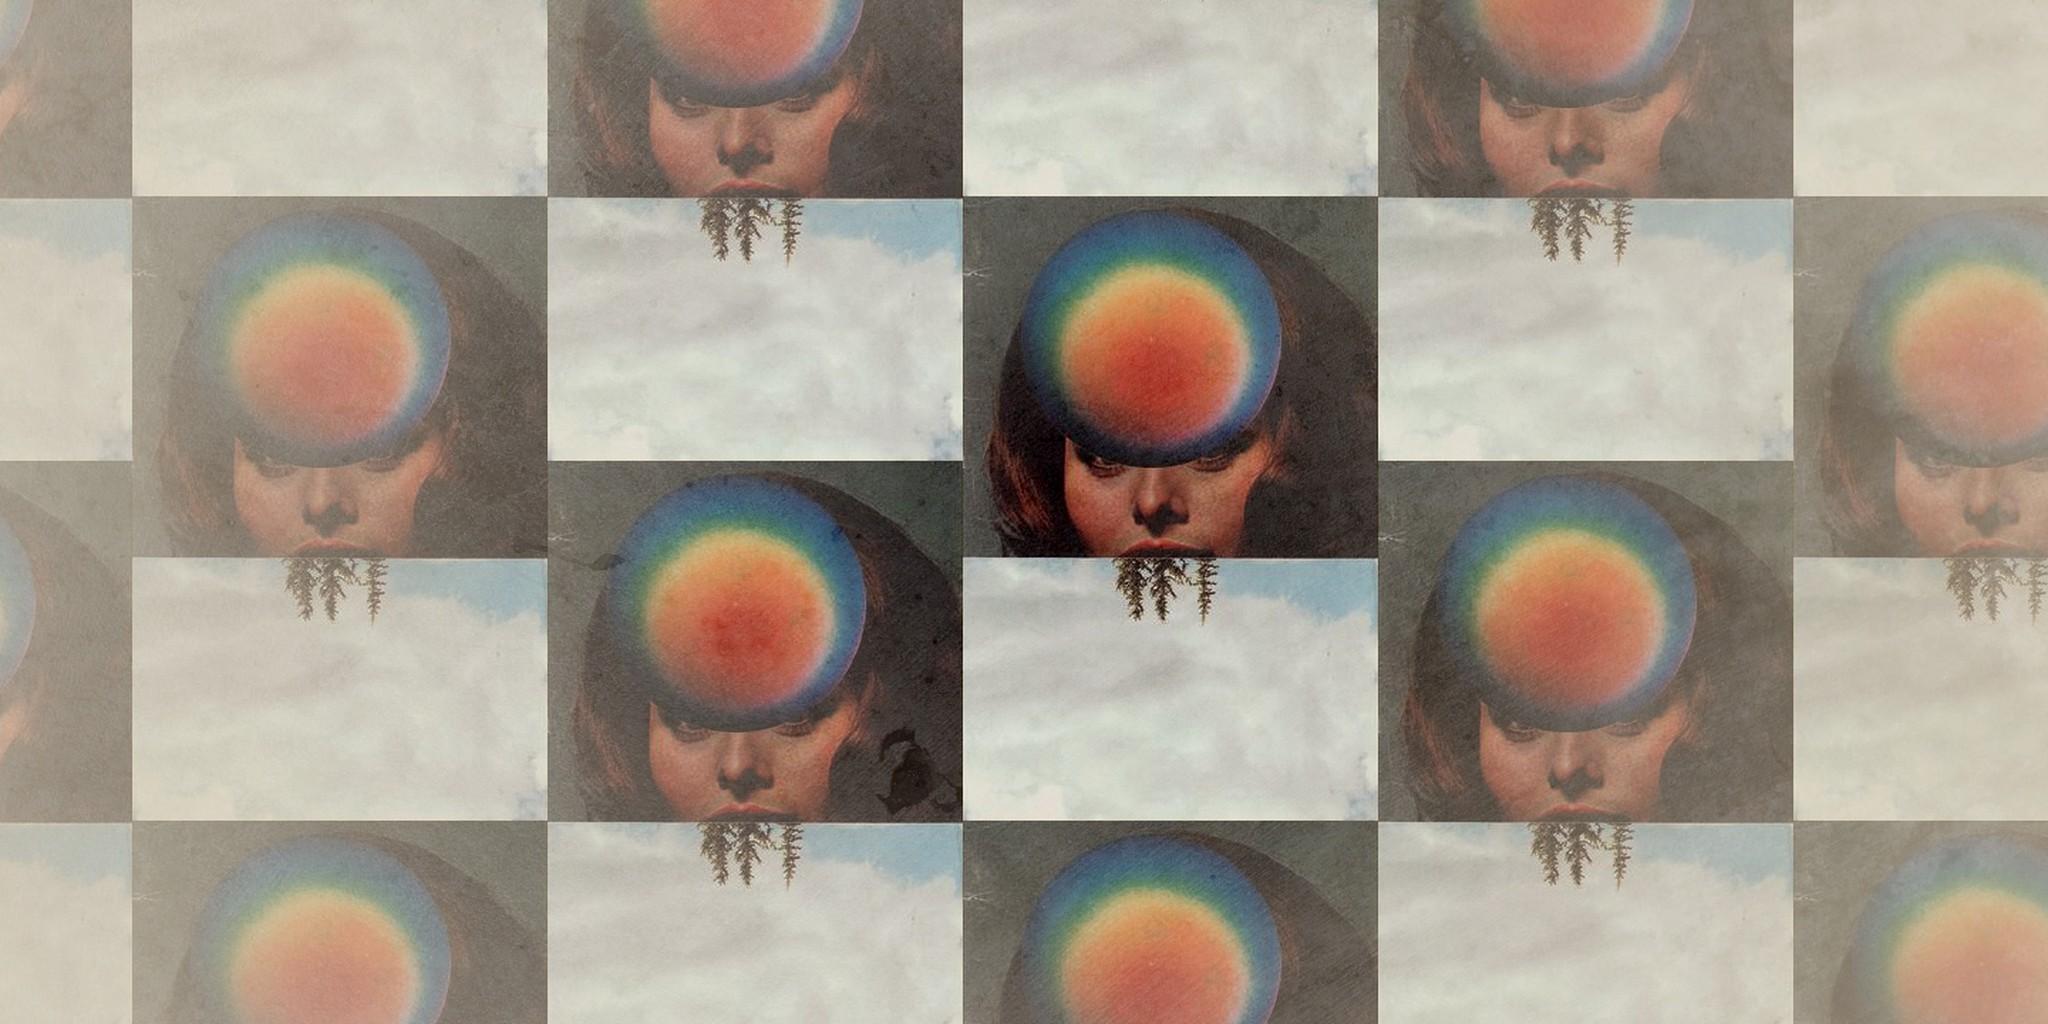 collage of brand new's album art